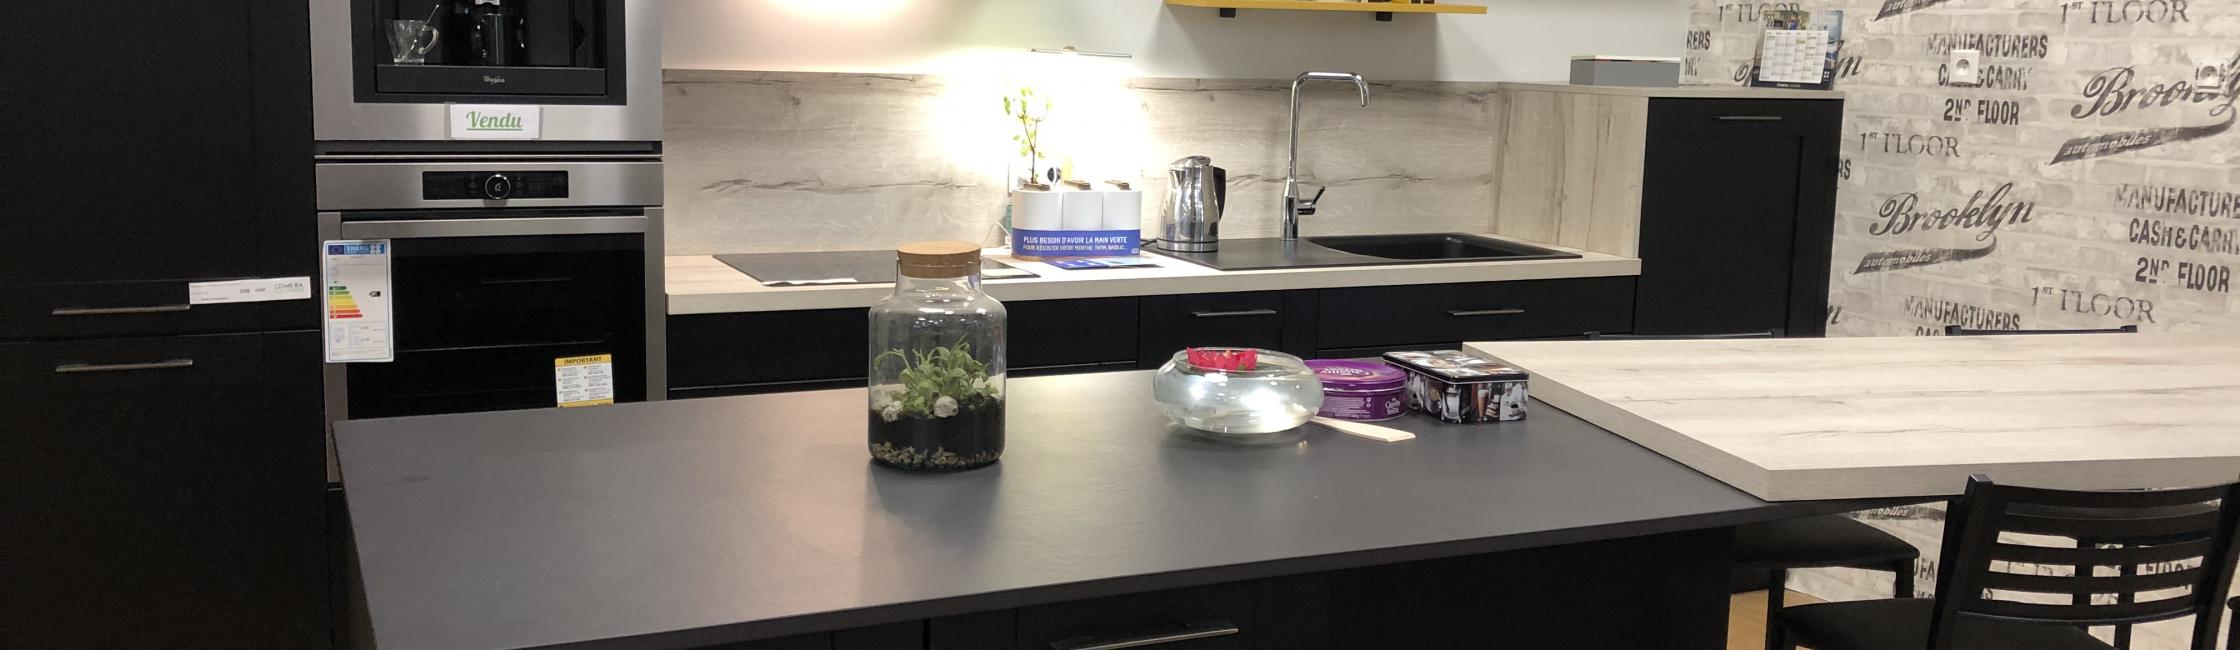 magasin-cuisines-amenagees-ilot-central-fonctionnel-les-herbiers